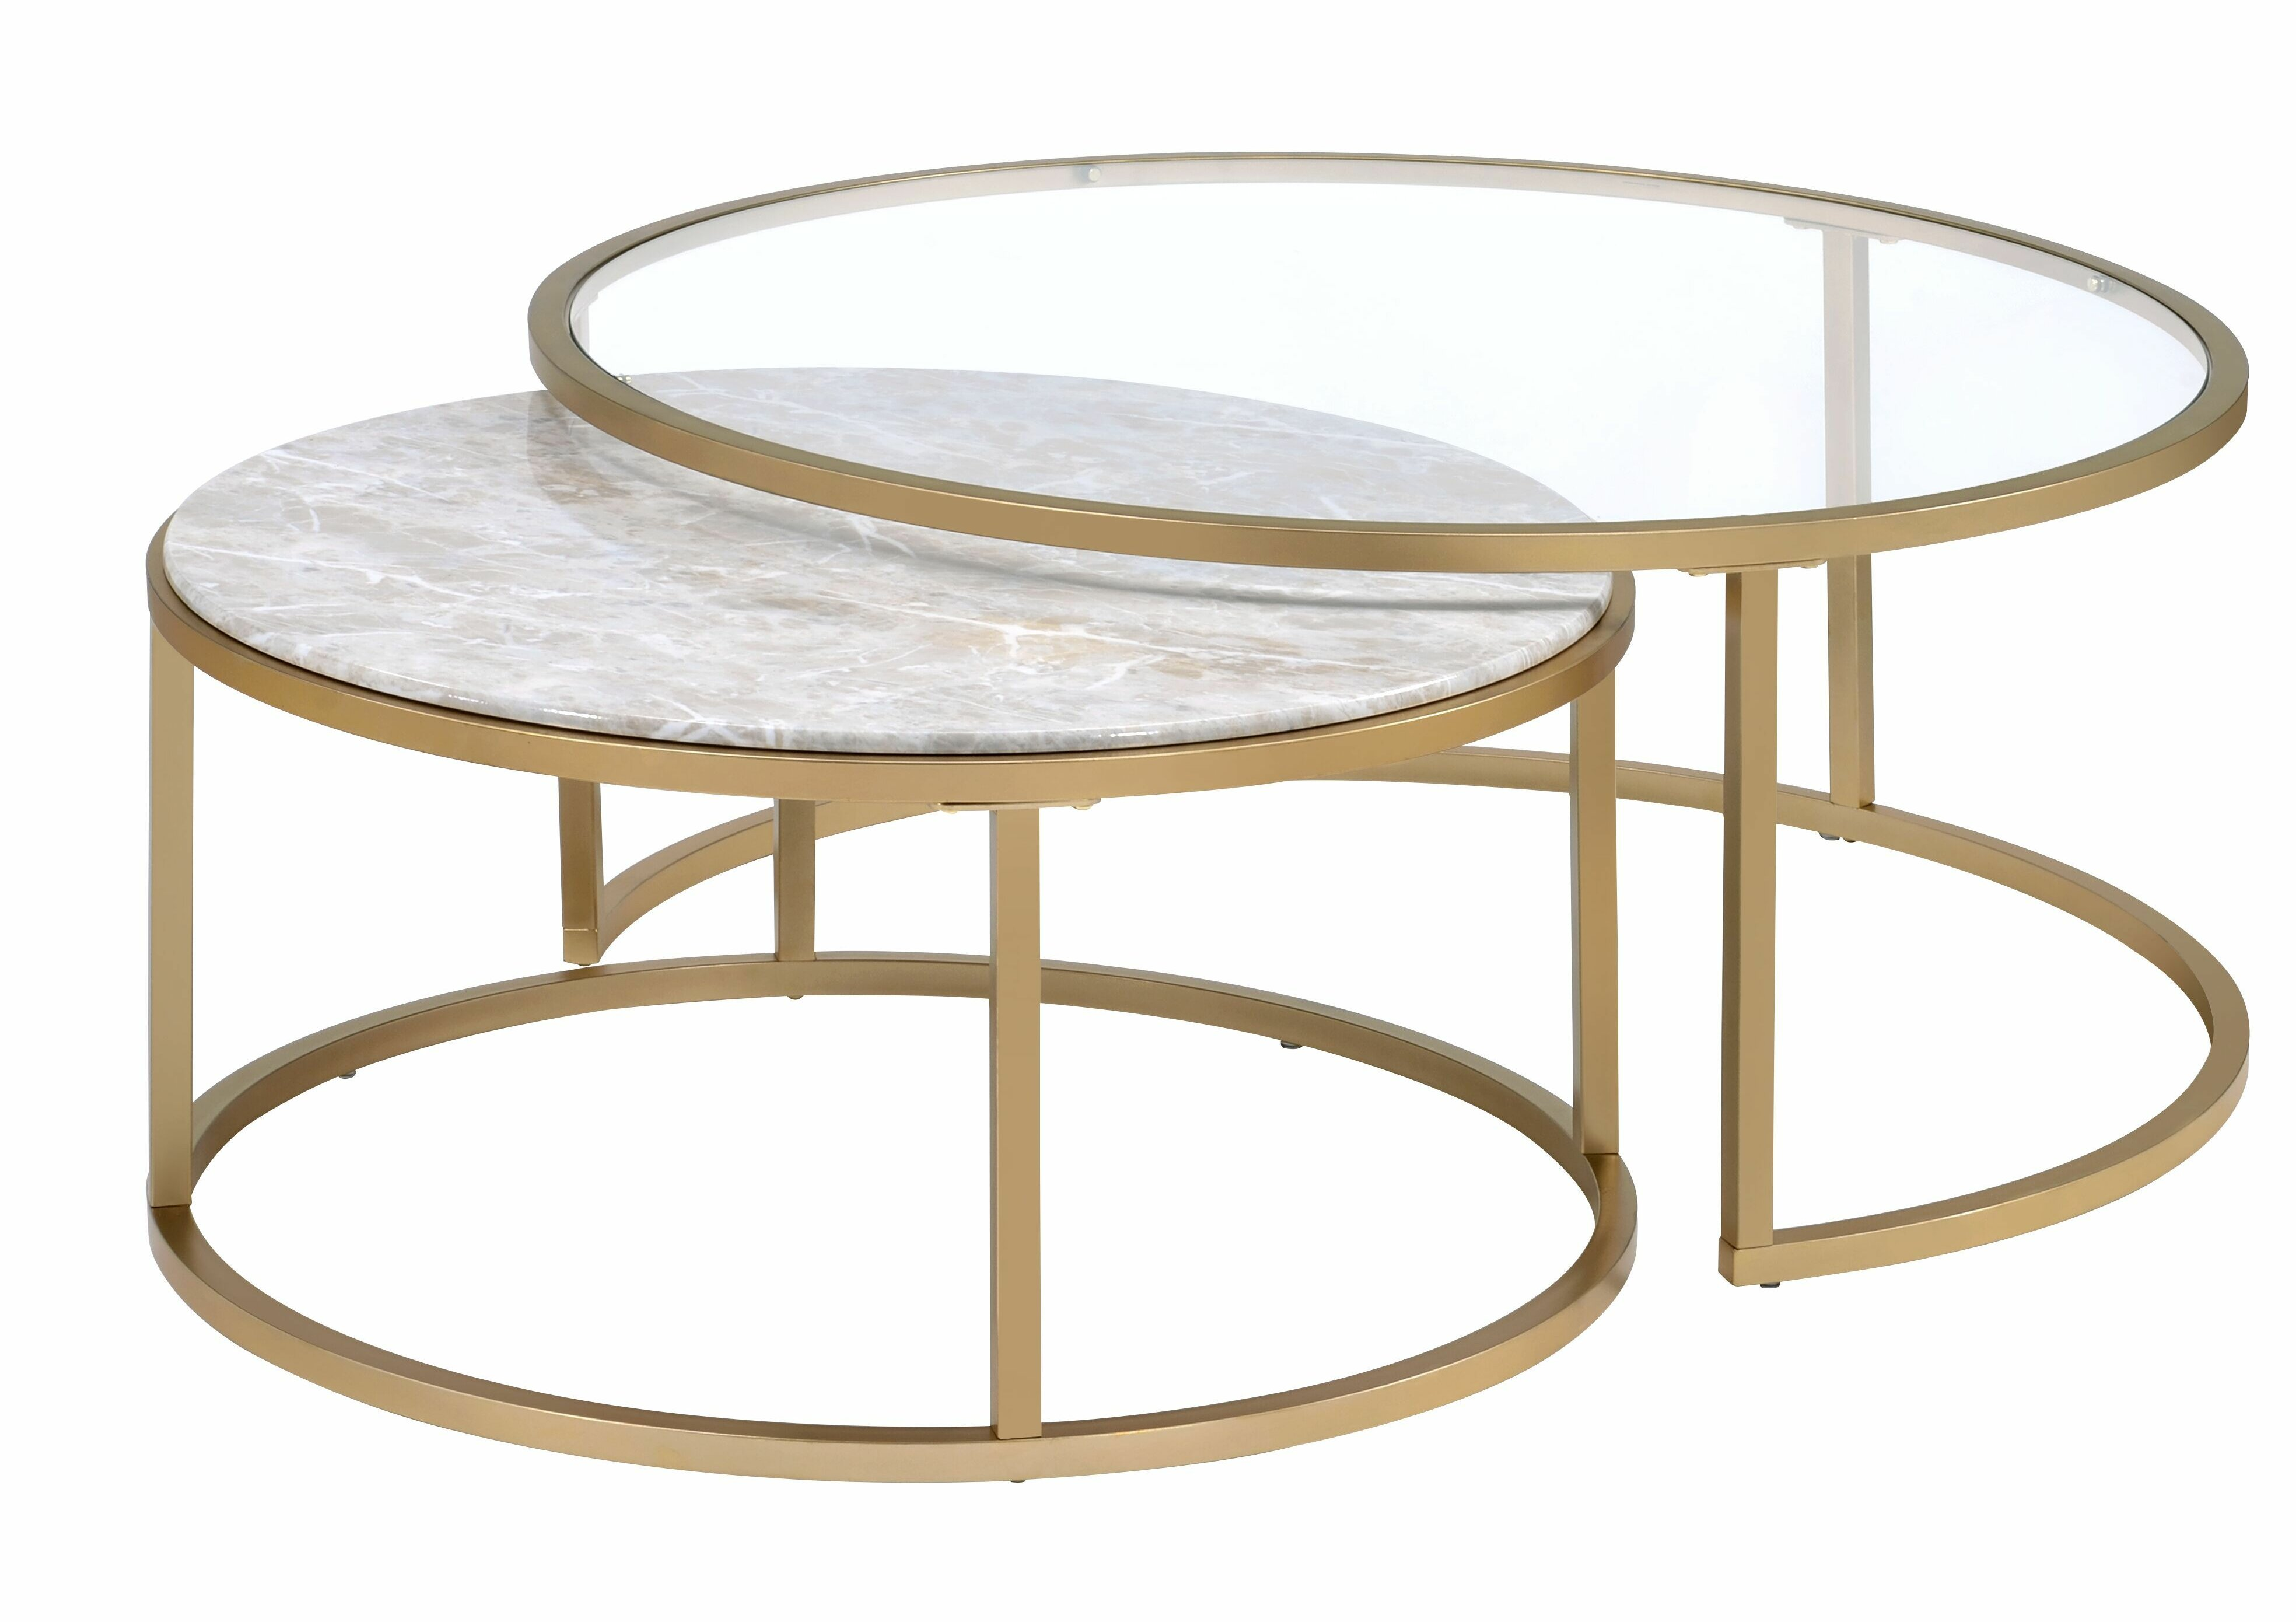 Anyan 2 Piece Coffee Table Set